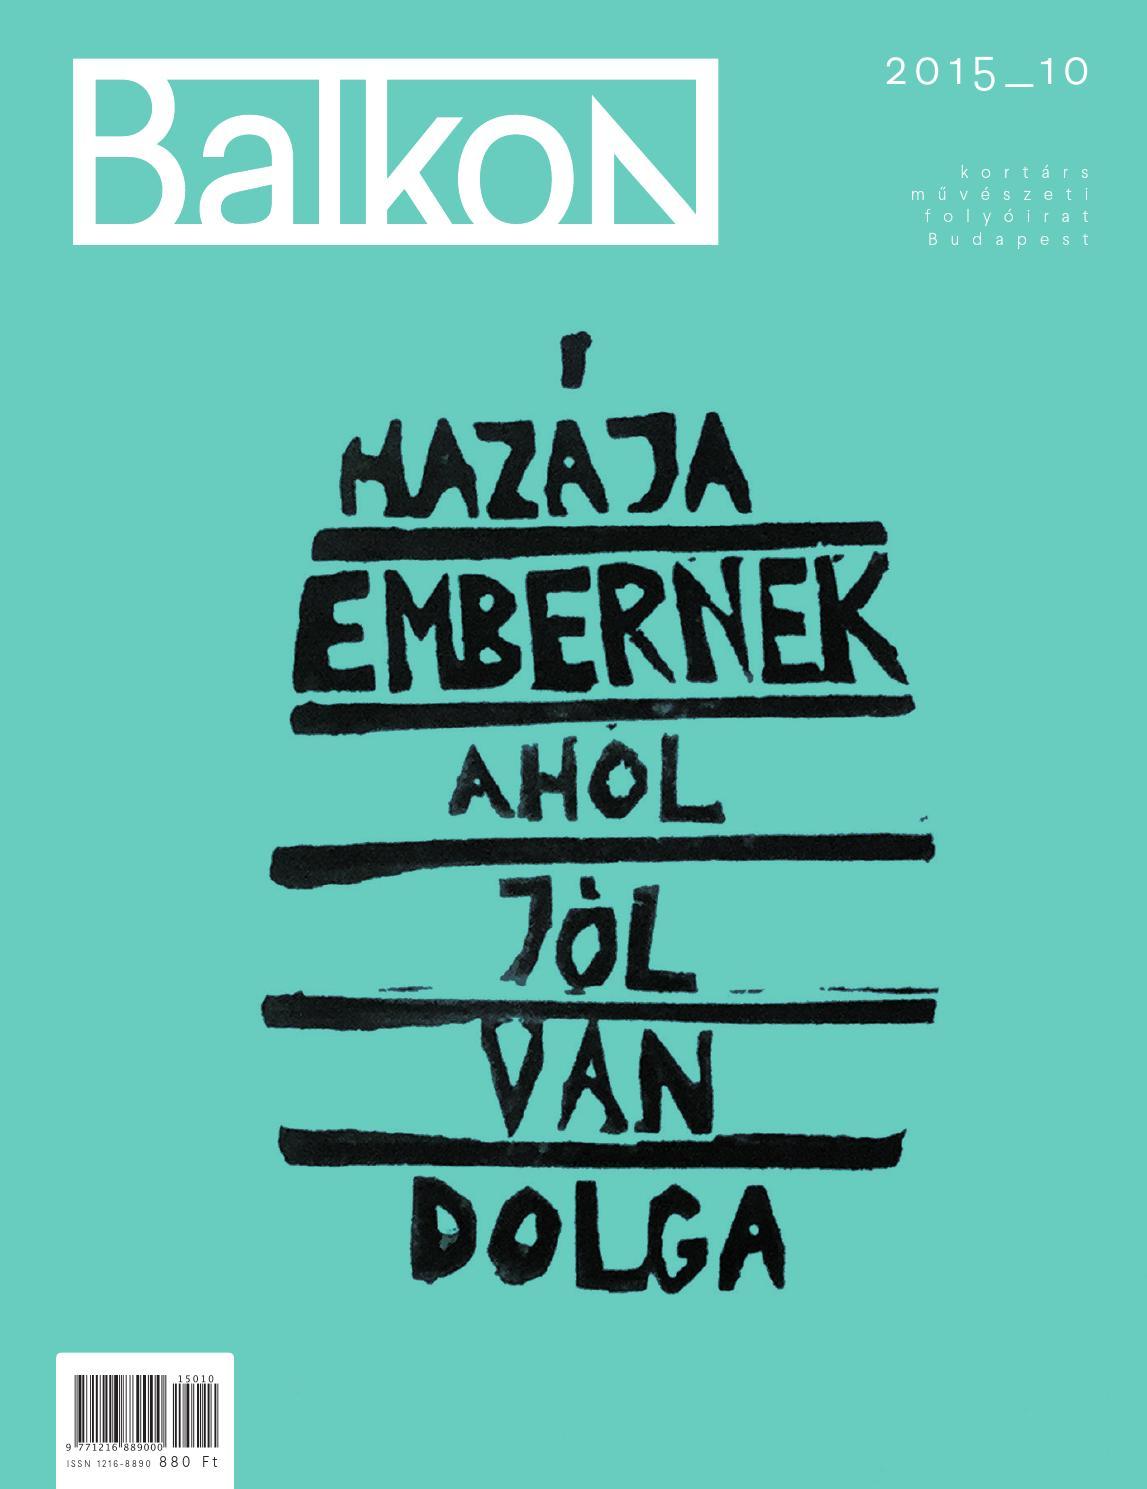 Balkon 2015 10 by Balkon - issuu d9ff208e40